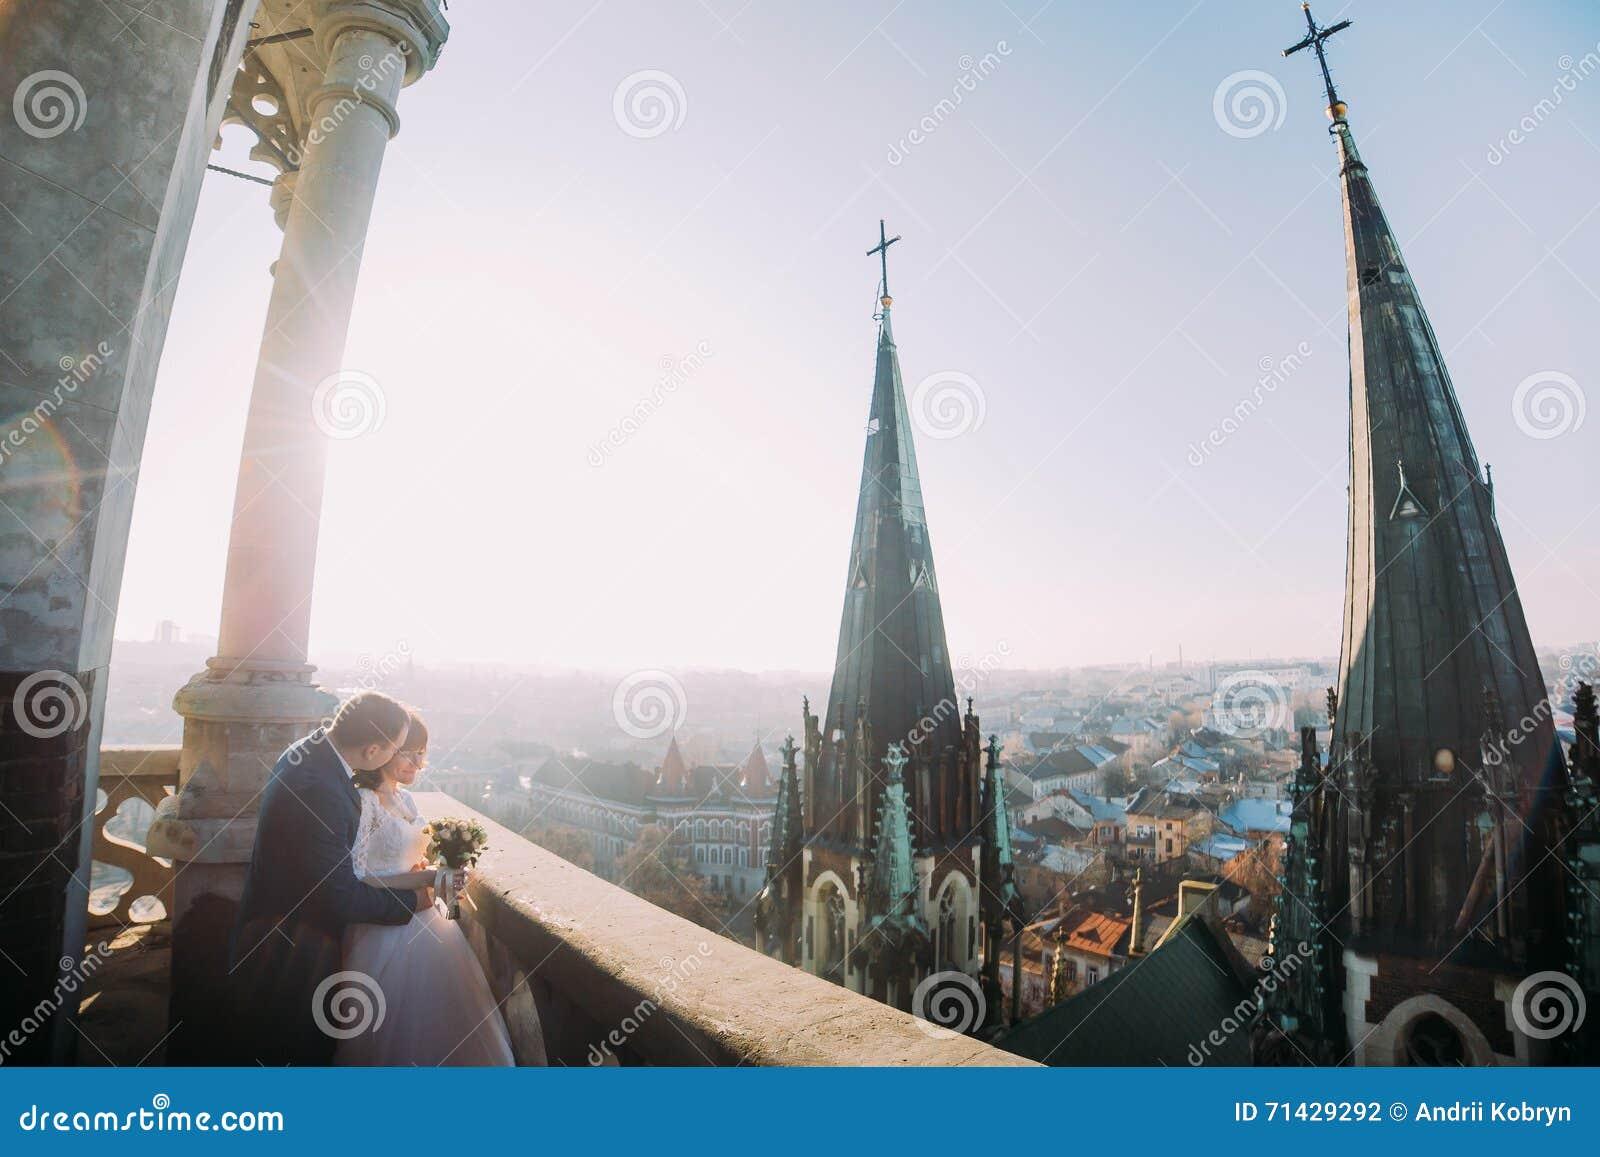 Het mooie paar, bruid en bruidegom stellen op oud balkon met kolom, cityscape achtergrond